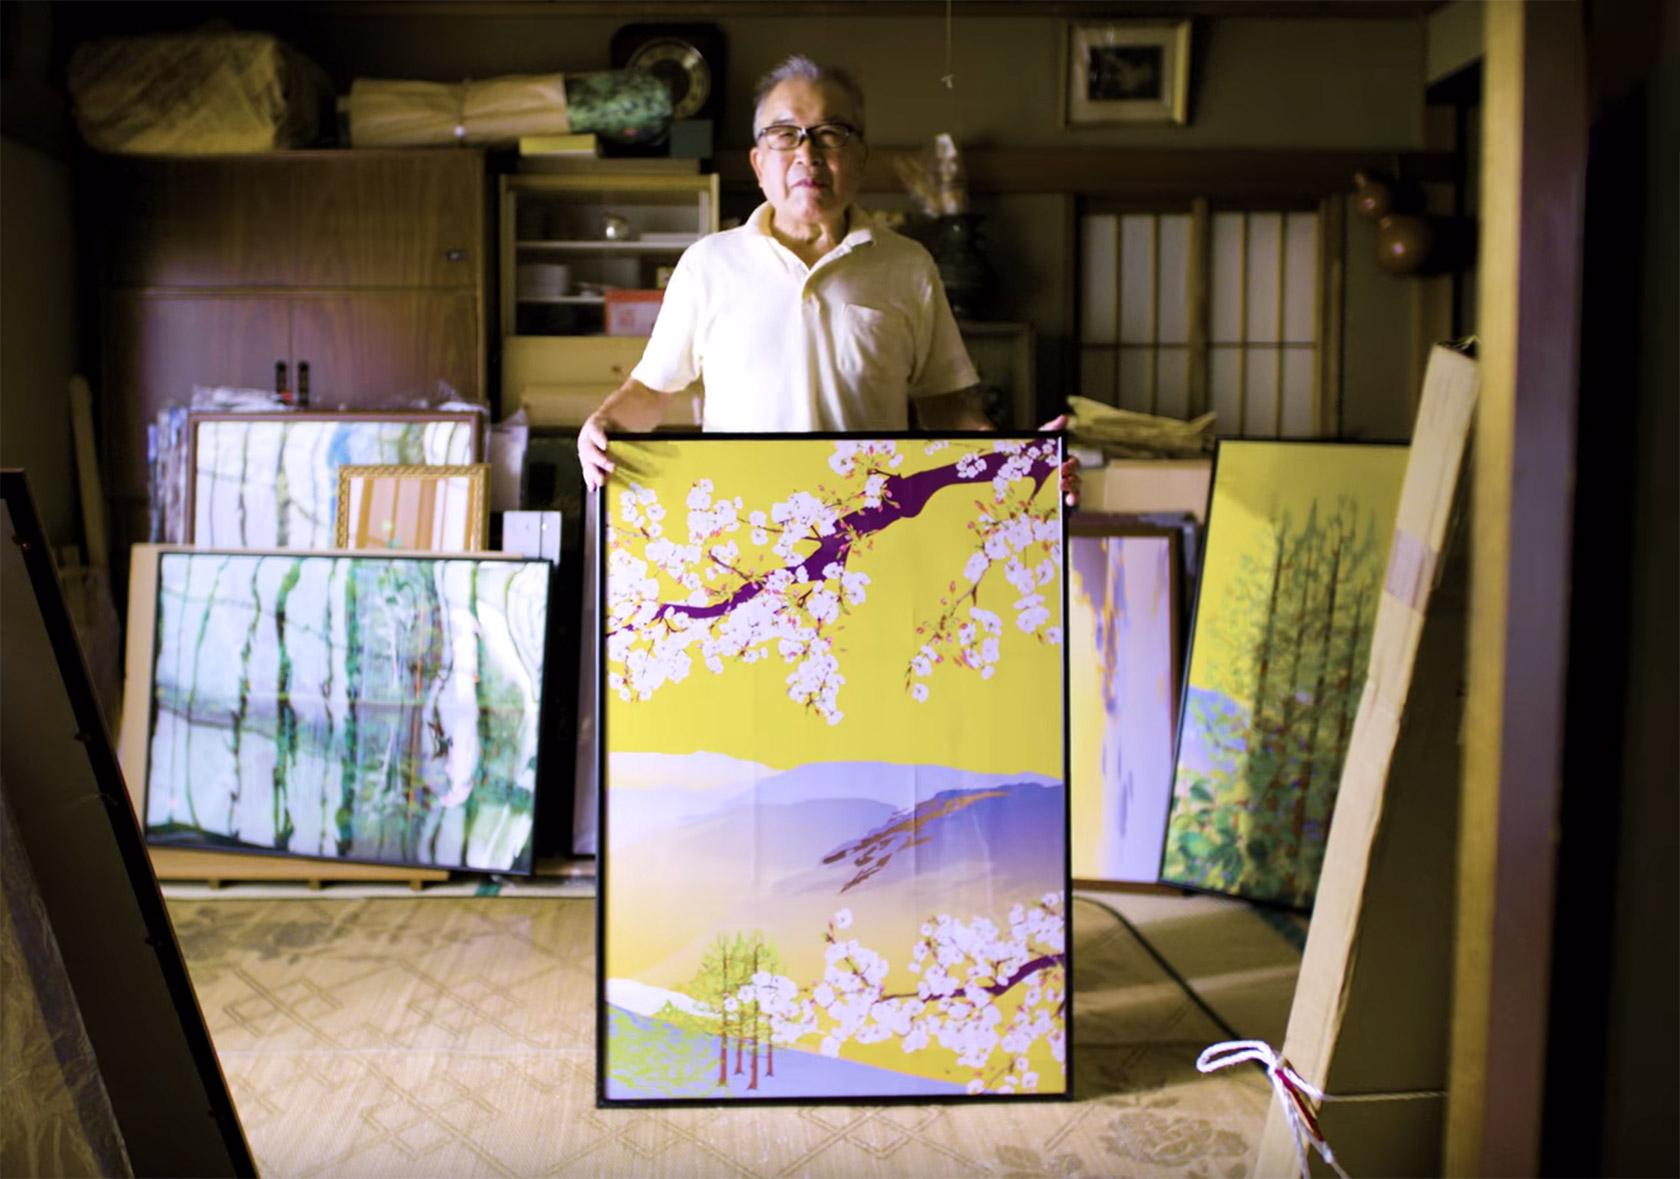 Microsoft Excel Artist Japan Tatsuo Horiuchi